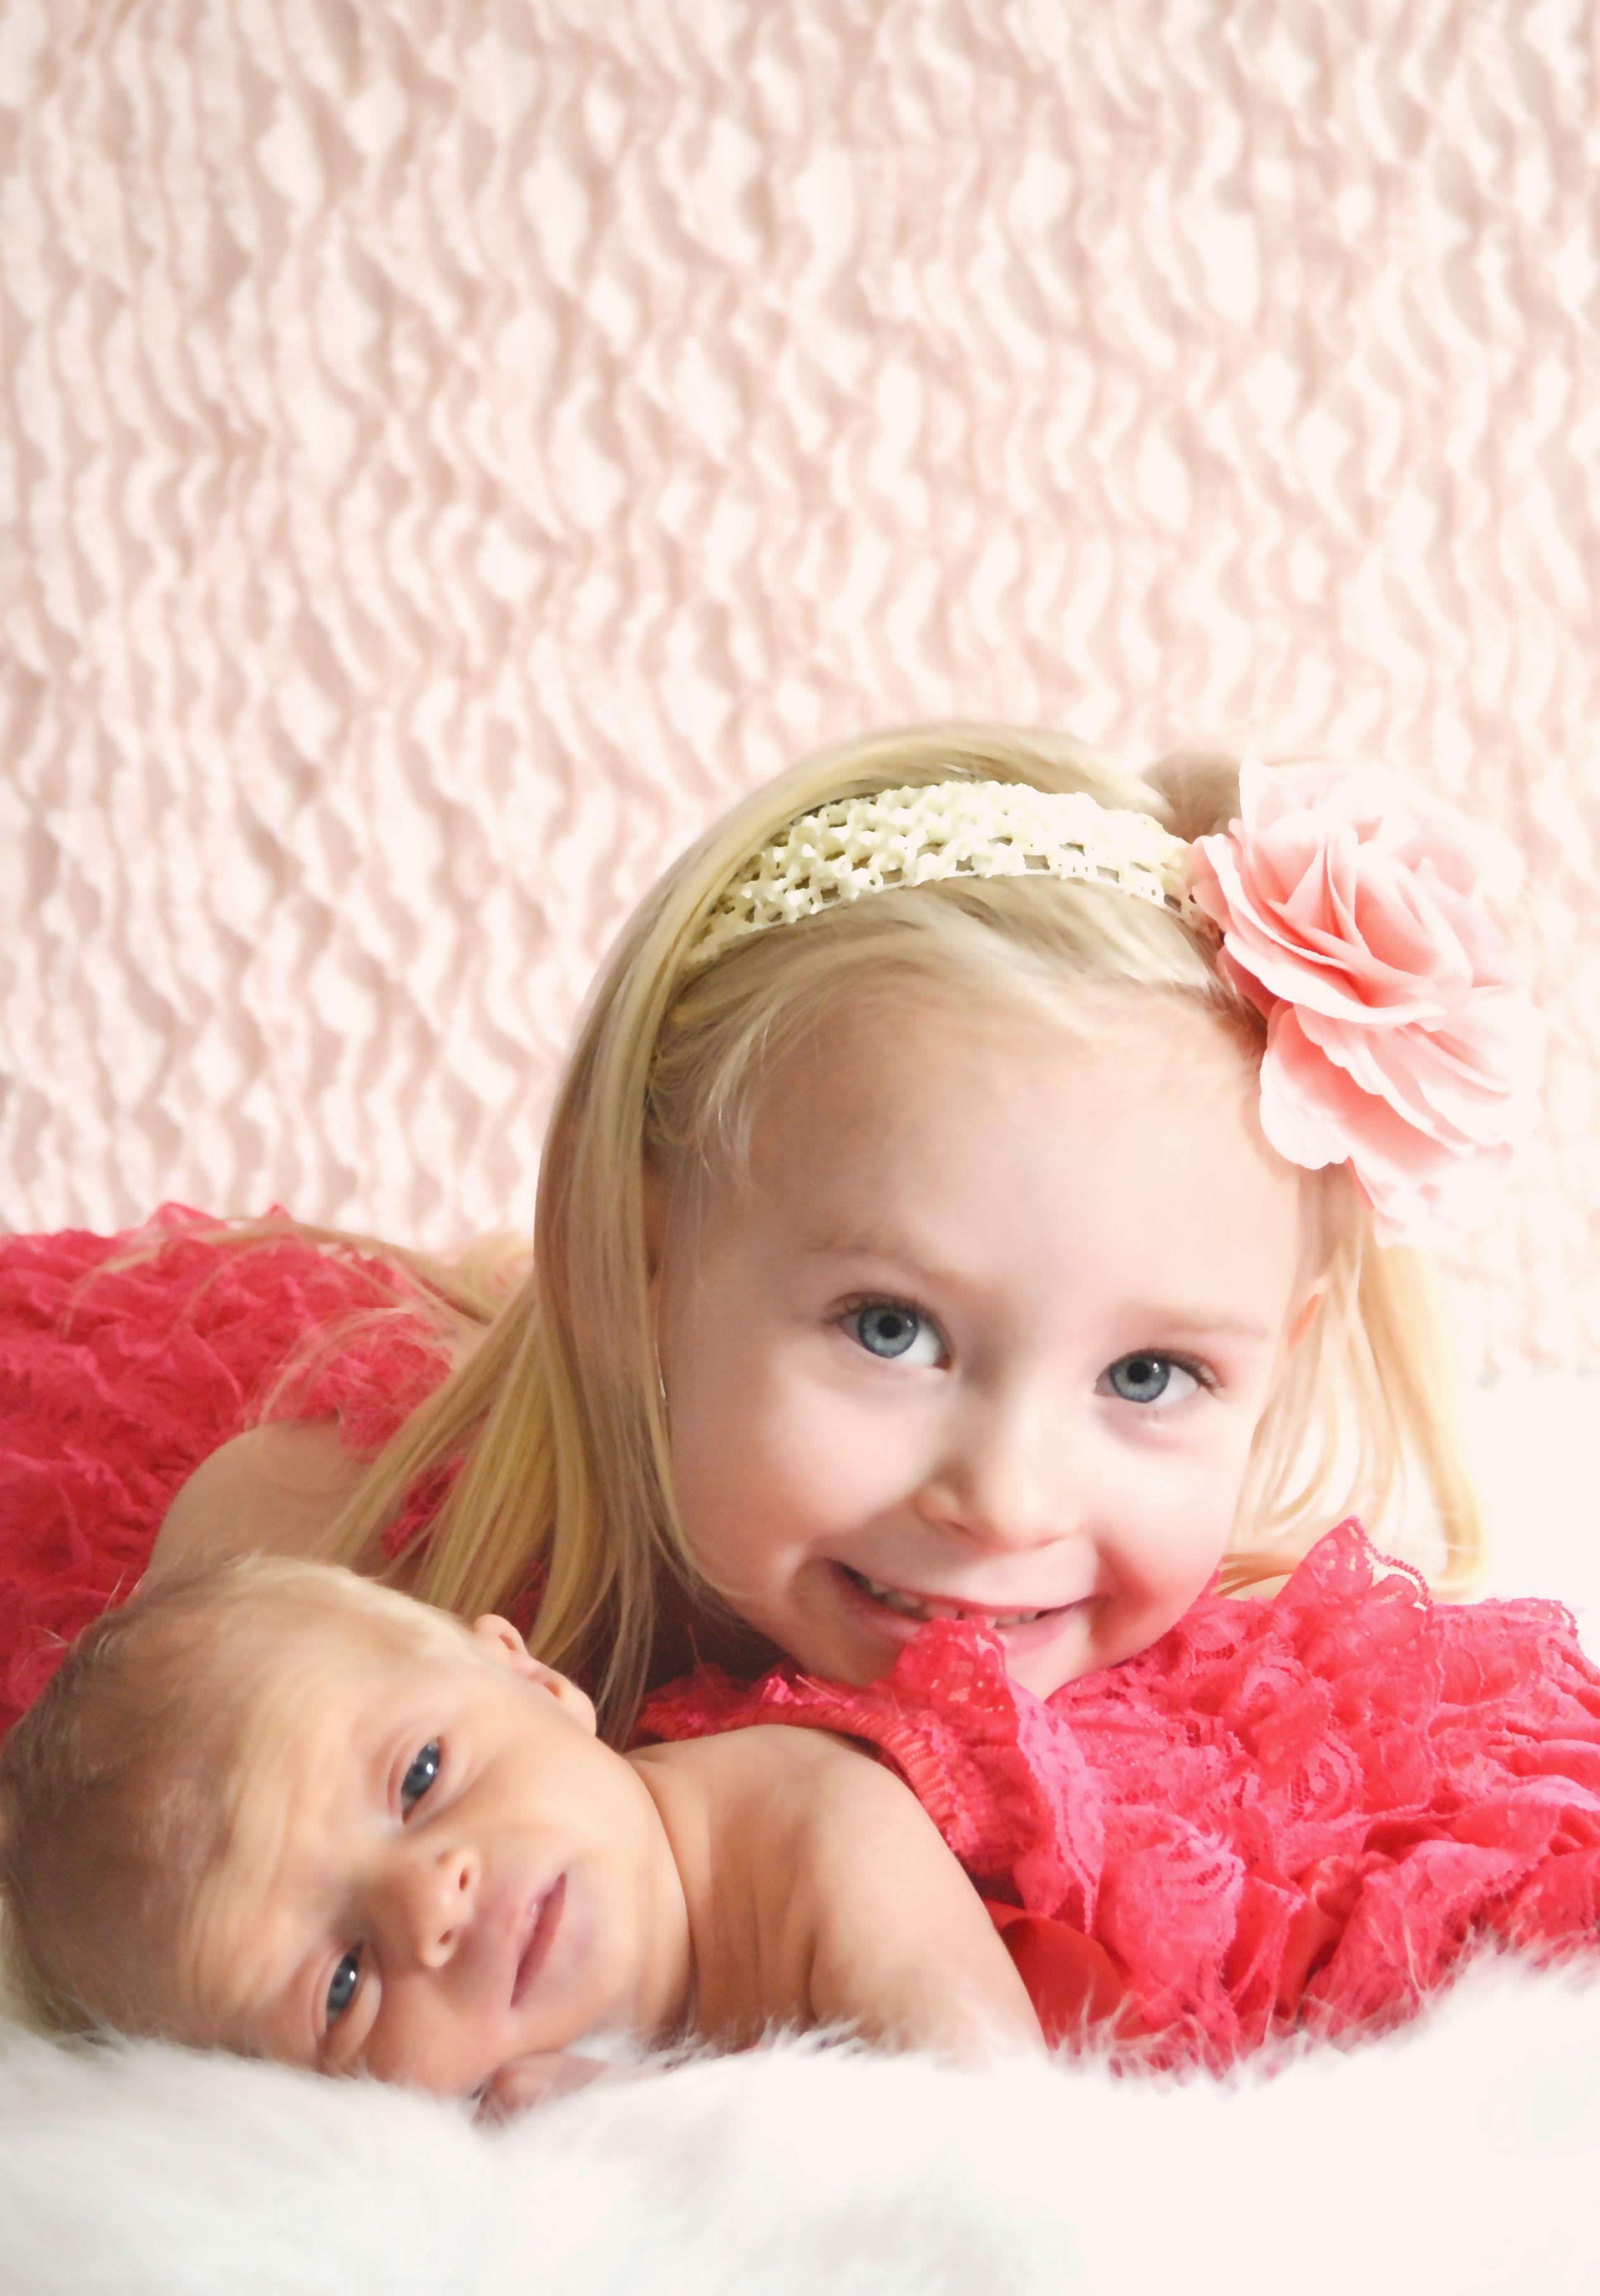 306e255817cf7 Big Sister Little Sister Newborn Baby Girl Photo Shoot PINK - This ...